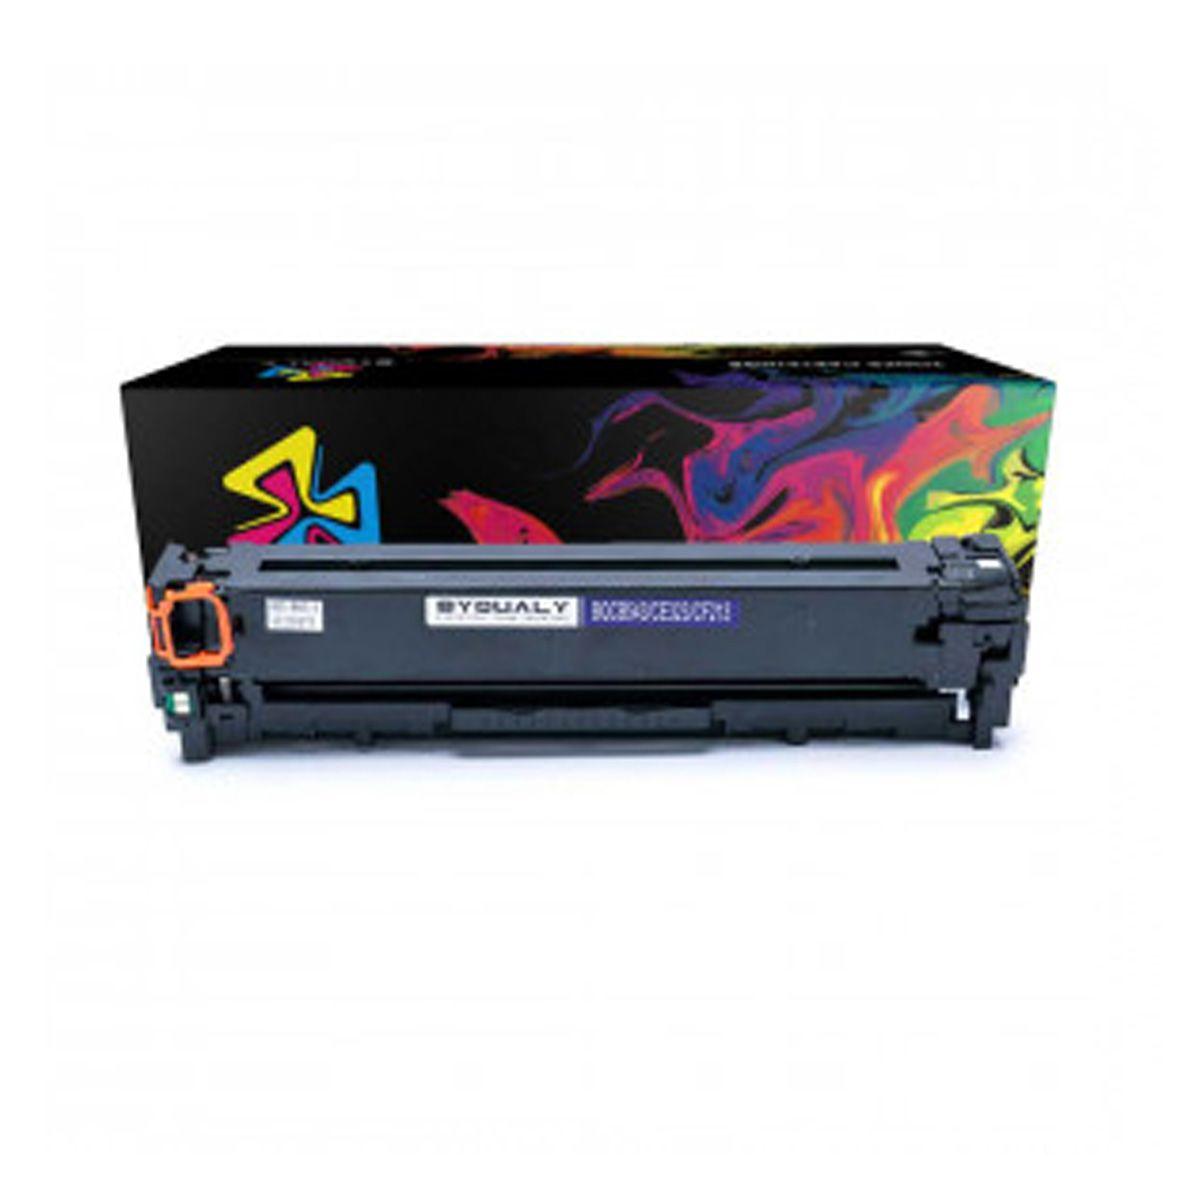 Toner Compativel com HP CB543A CB543 543 - 125A - Magenta - CP1215 CP1510 CP1515 CP1518 CM1312 - 1,4K